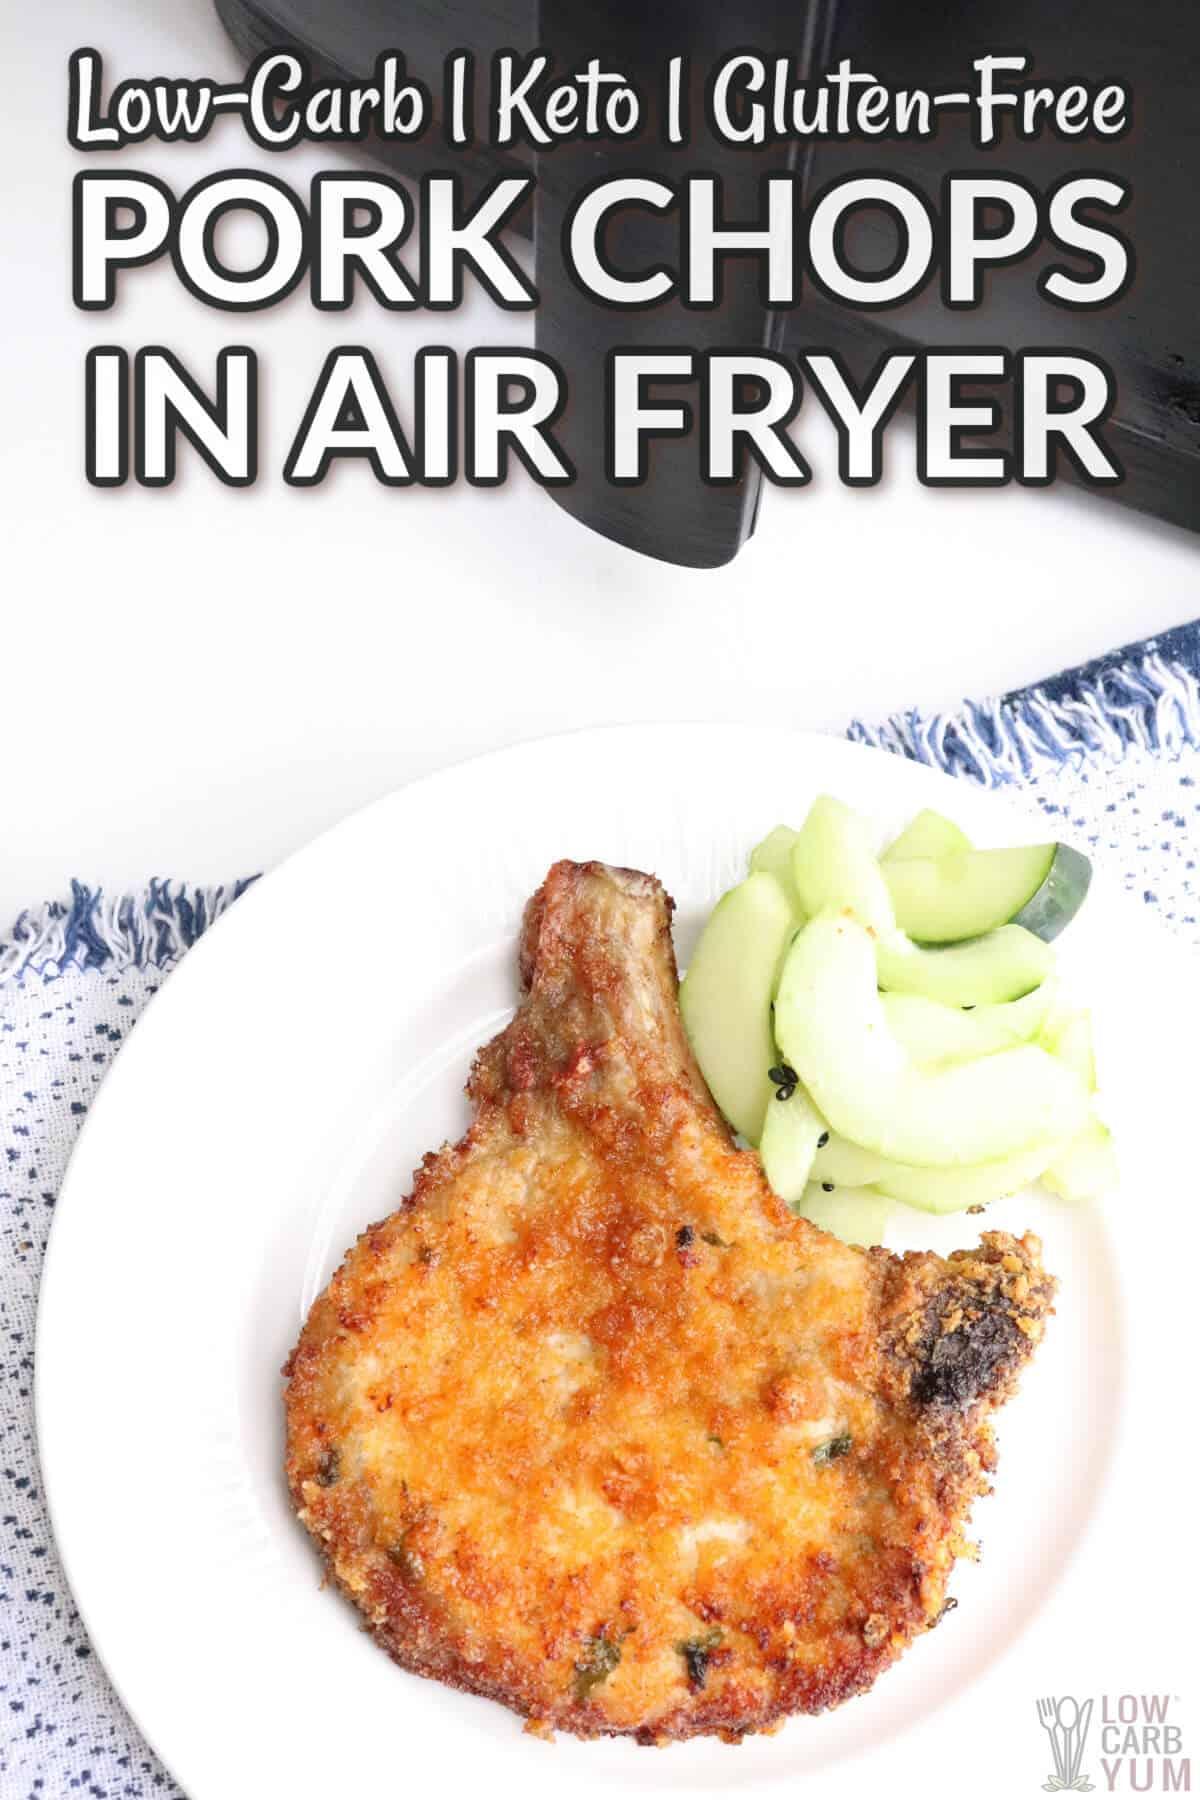 pork chops in air fryer cover image